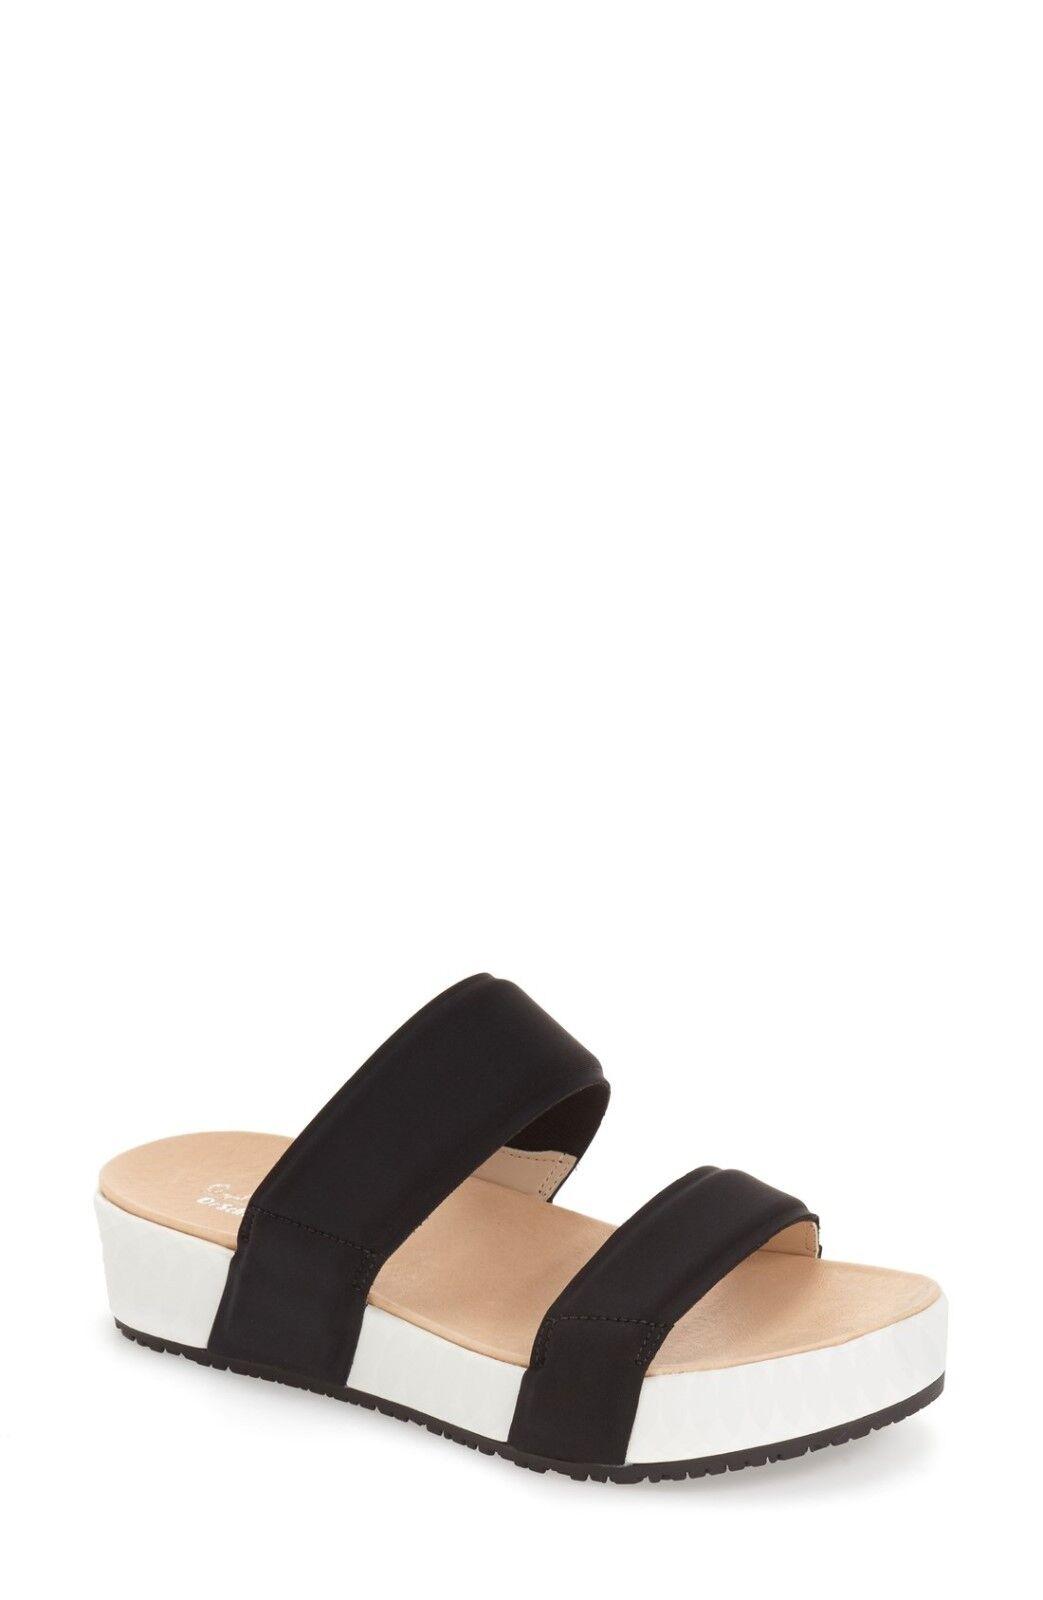 Athleta Frazzle Black Sandal by Dr. Scholl's, Black Frazzle Neoprene/White SIZE 8 39e22c